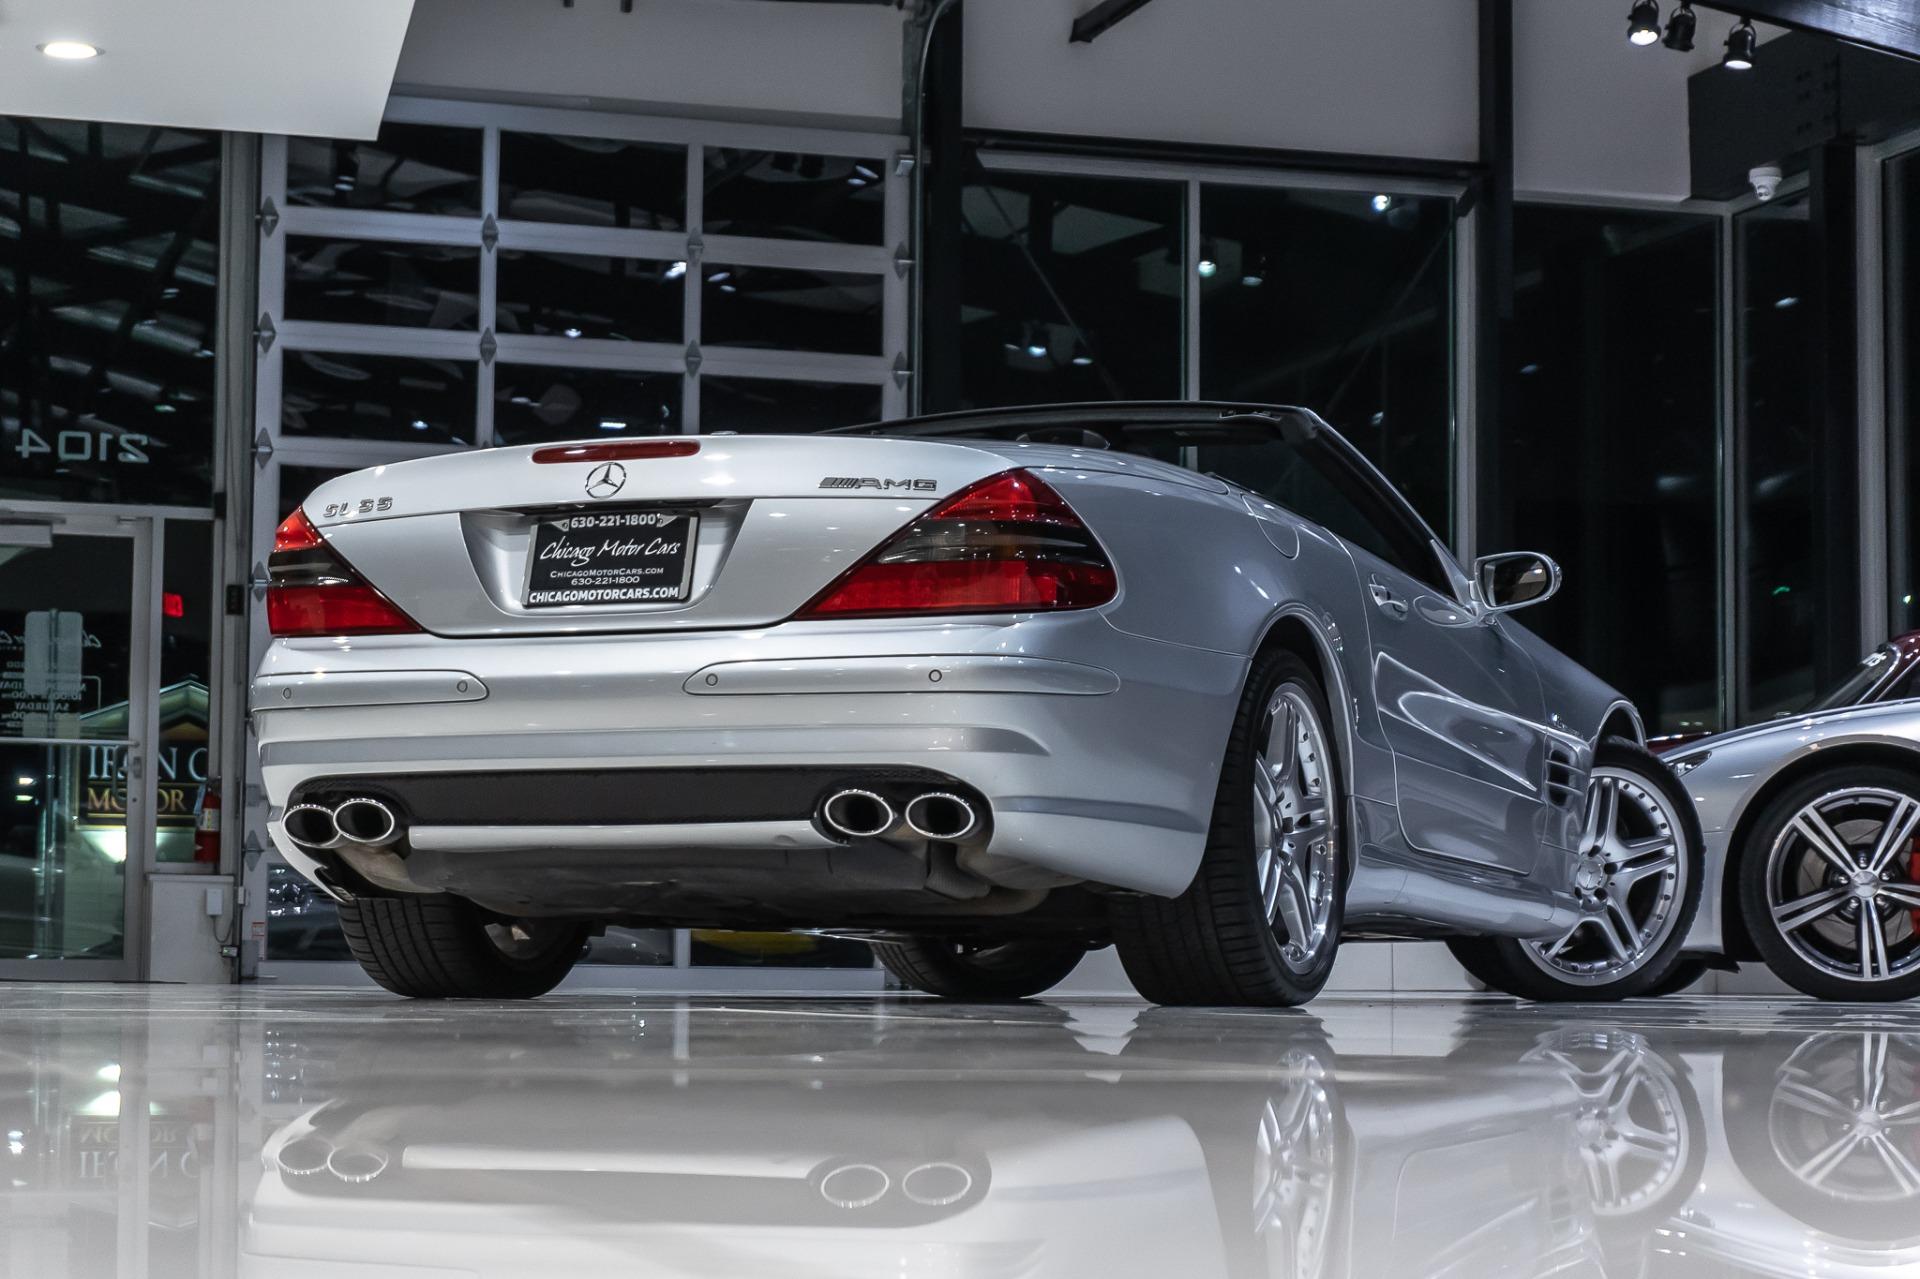 Used-2006-Mercedes-Benz-SL55-AMG-Roadster-P30-PERFORMANCE-PKG